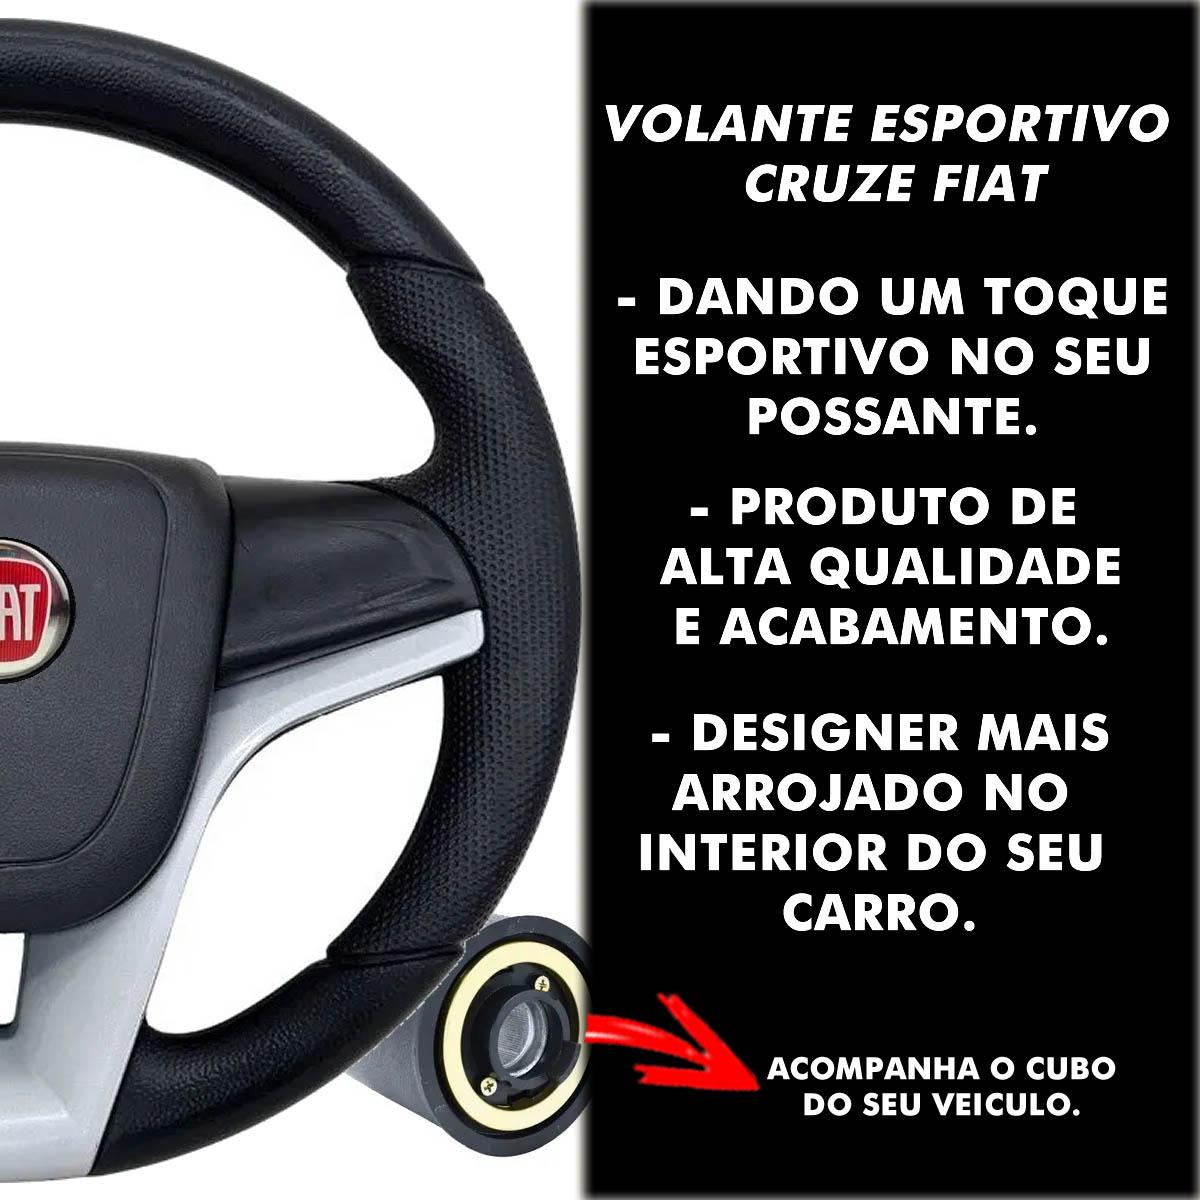 Volante Fiat Cruze Esportivo Cubo Atacado Poliparts